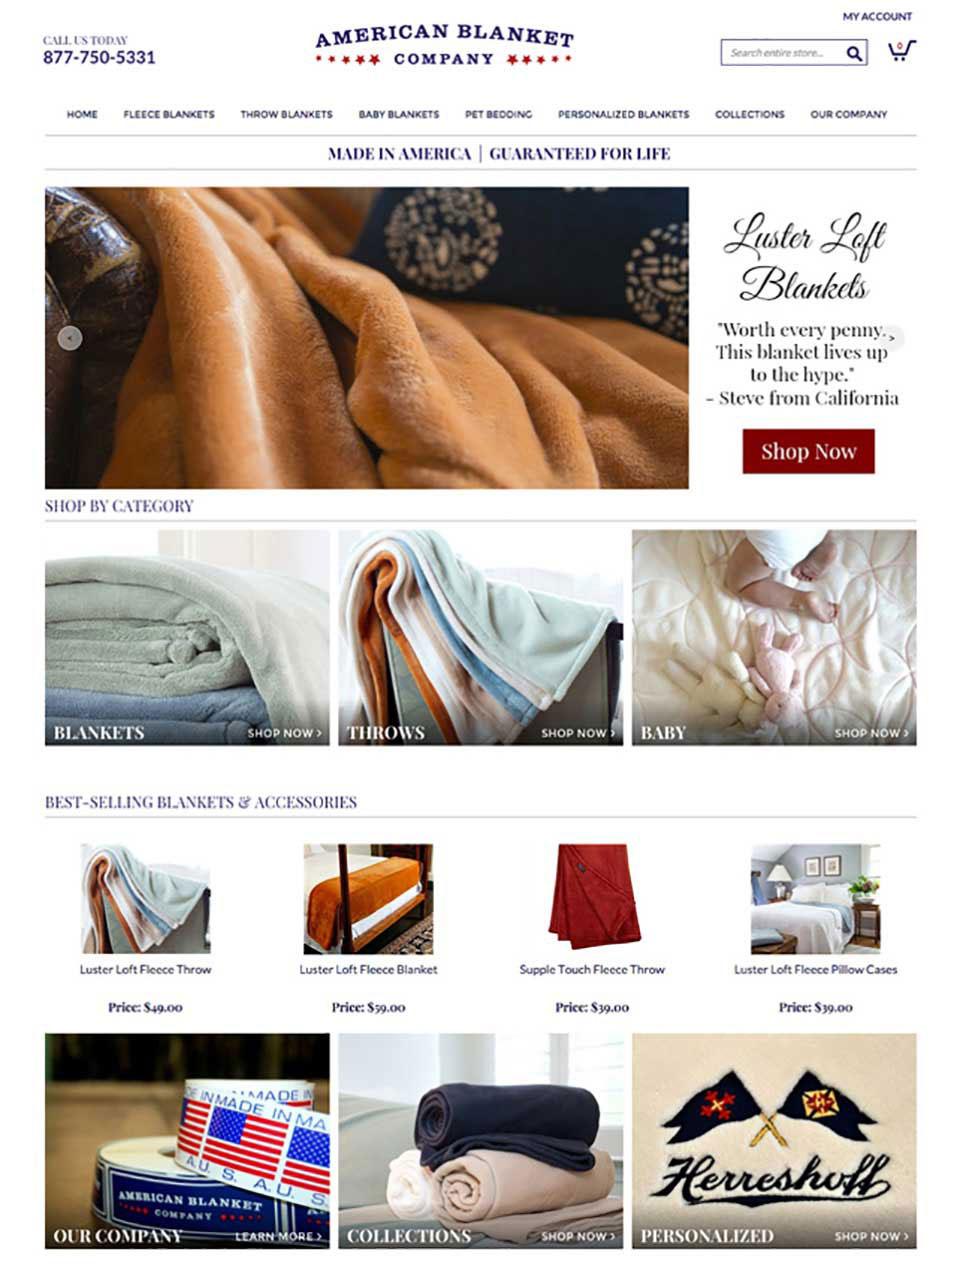 American Blanket Company